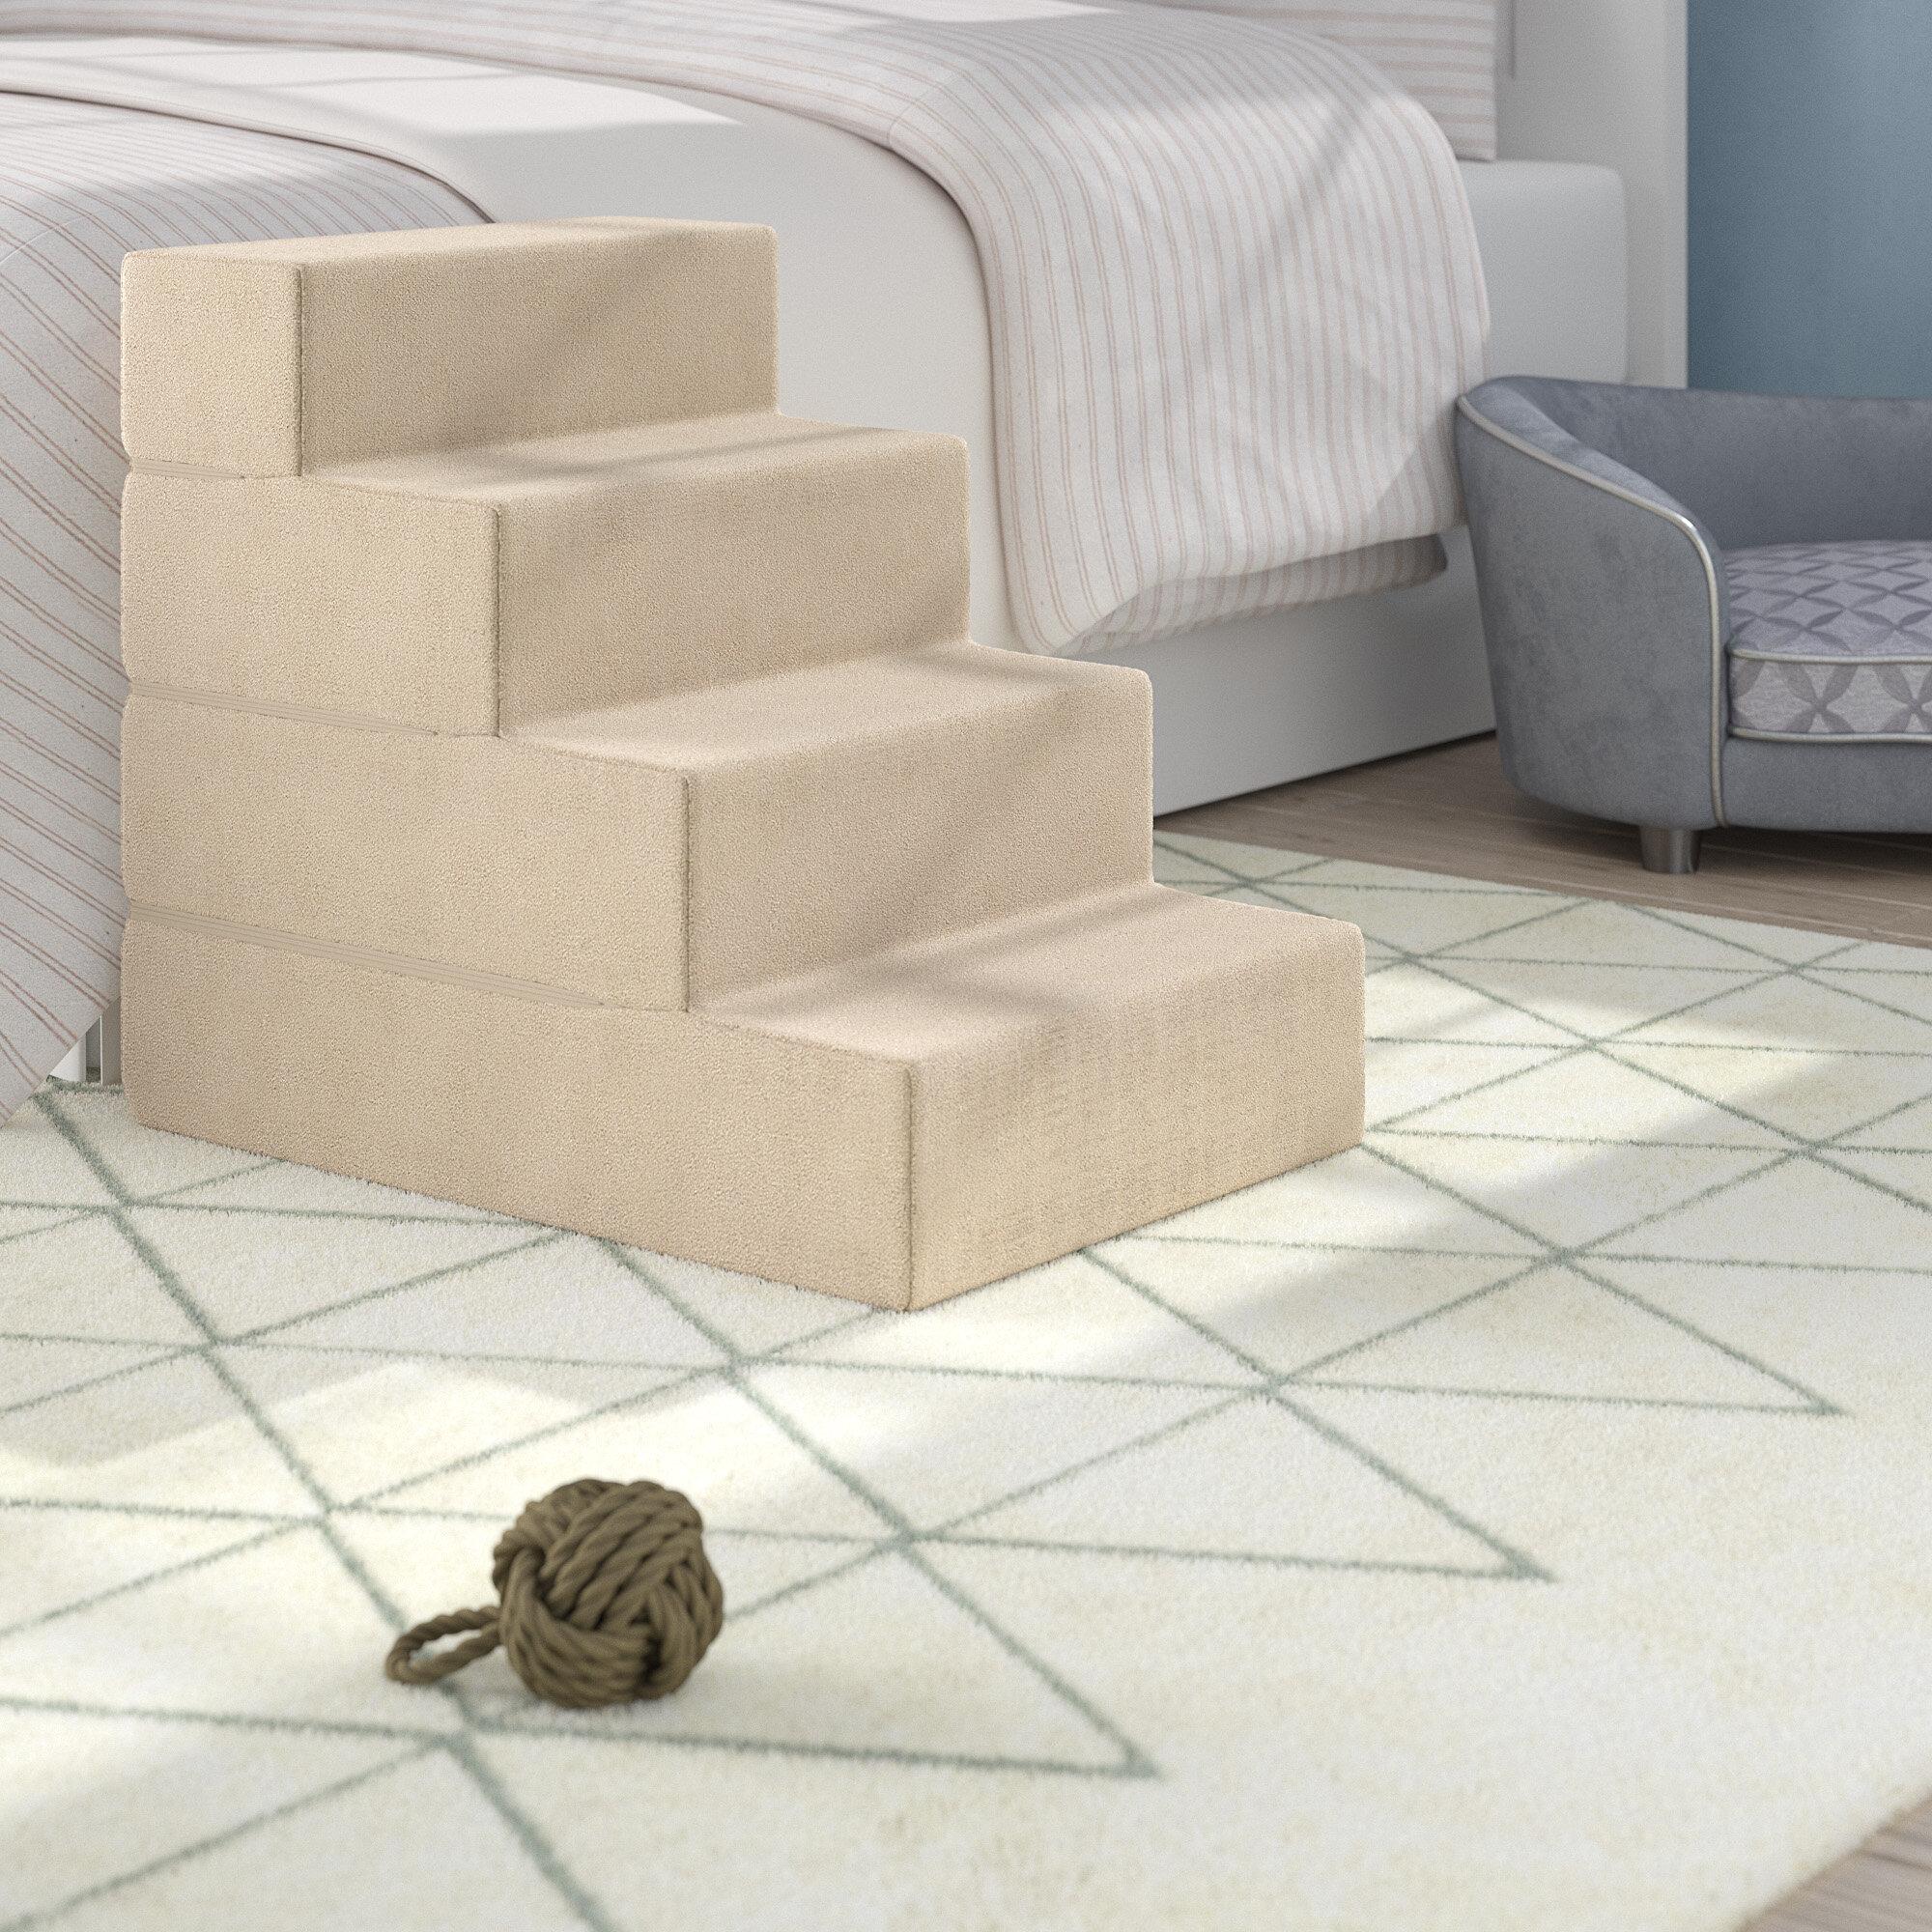 Charmant Dashiel 4 Step Pet Stair